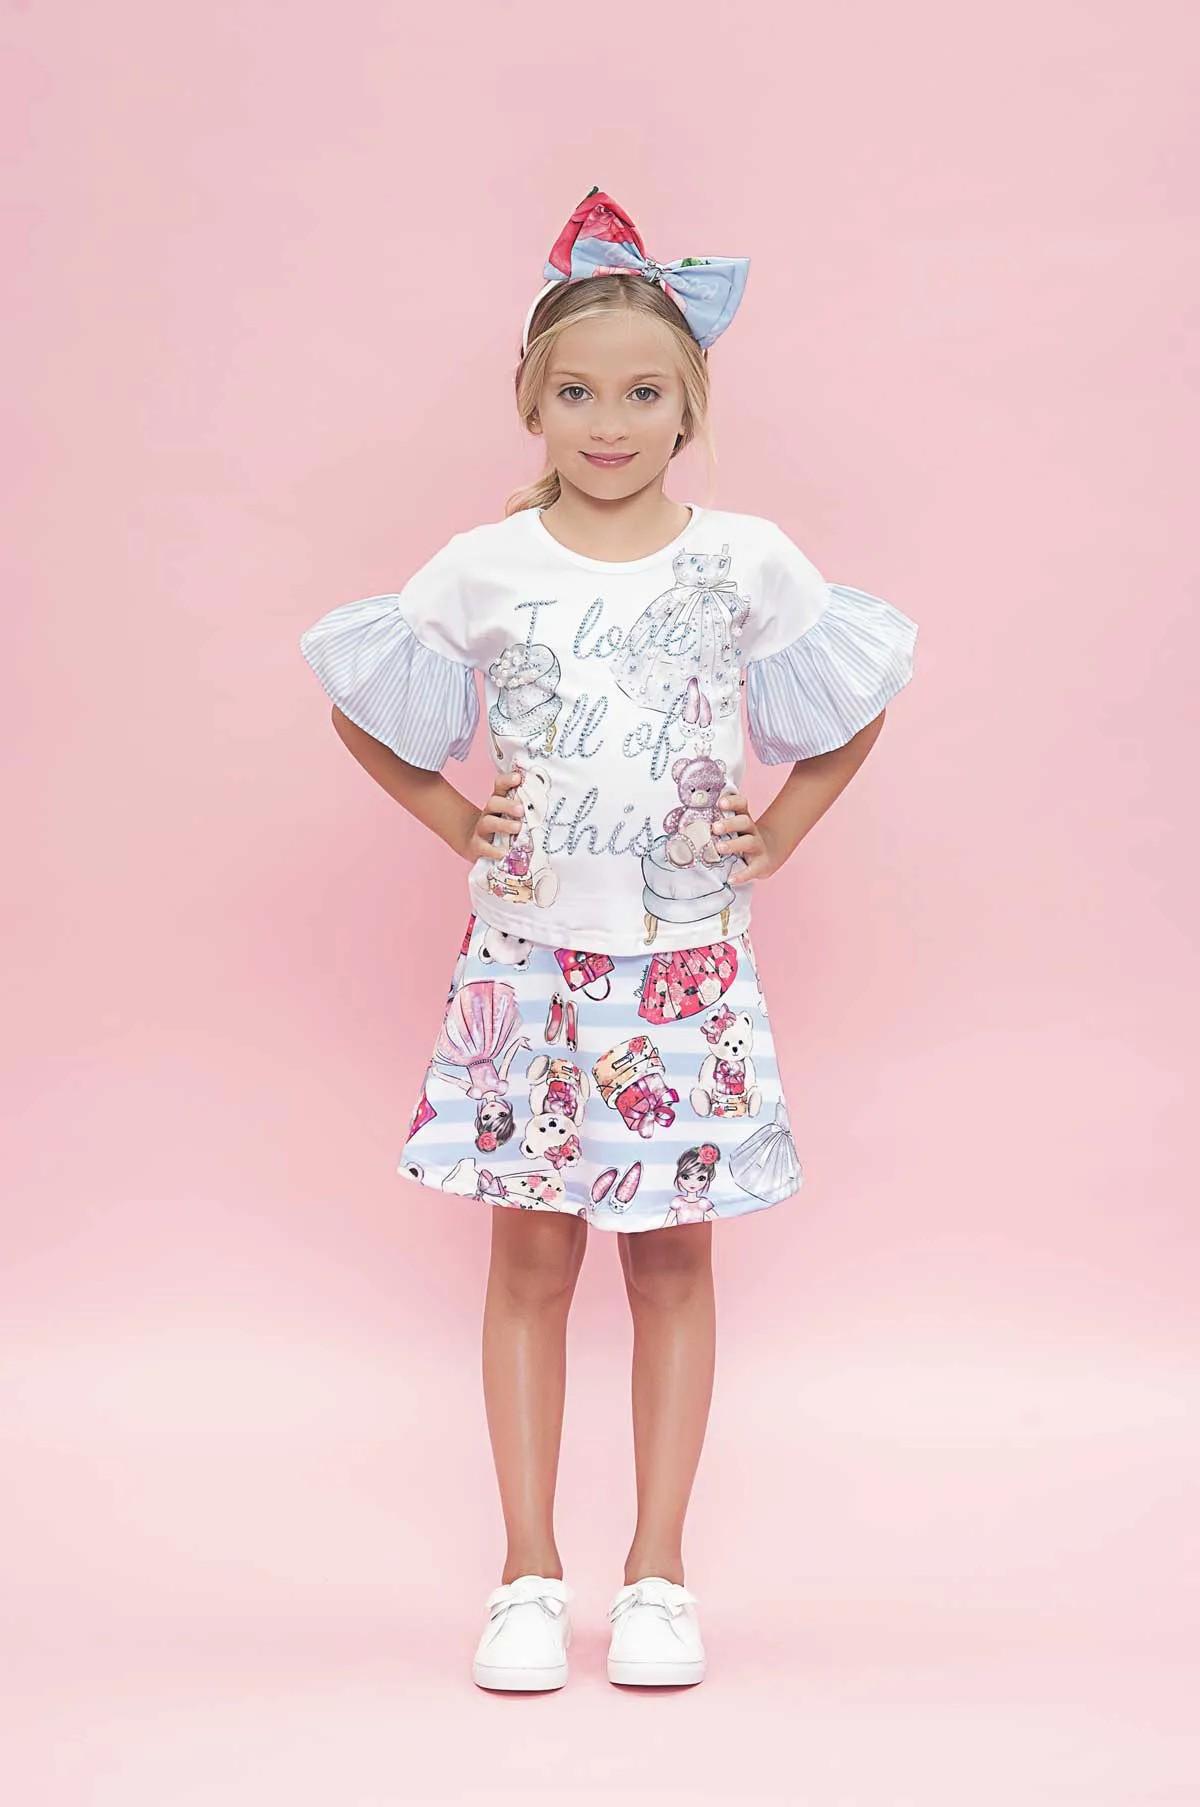 Blusa Cotton Detalhe MG Itens Closet Pituchinhus Premium